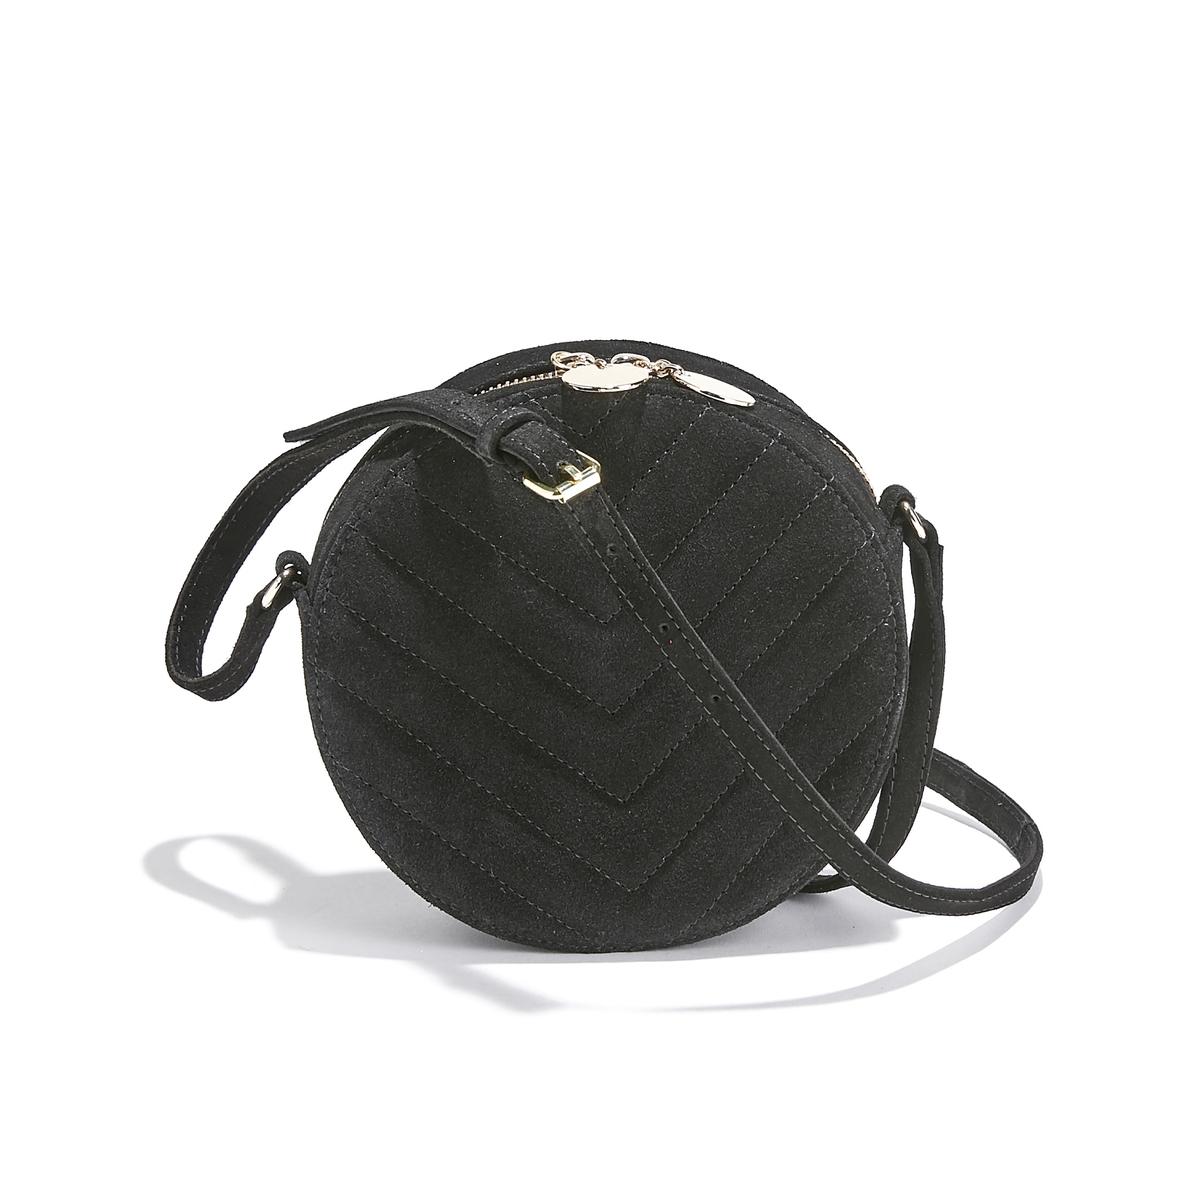 Сумка круглая на молнии ARAMIS сумка круглая на молнии aramis